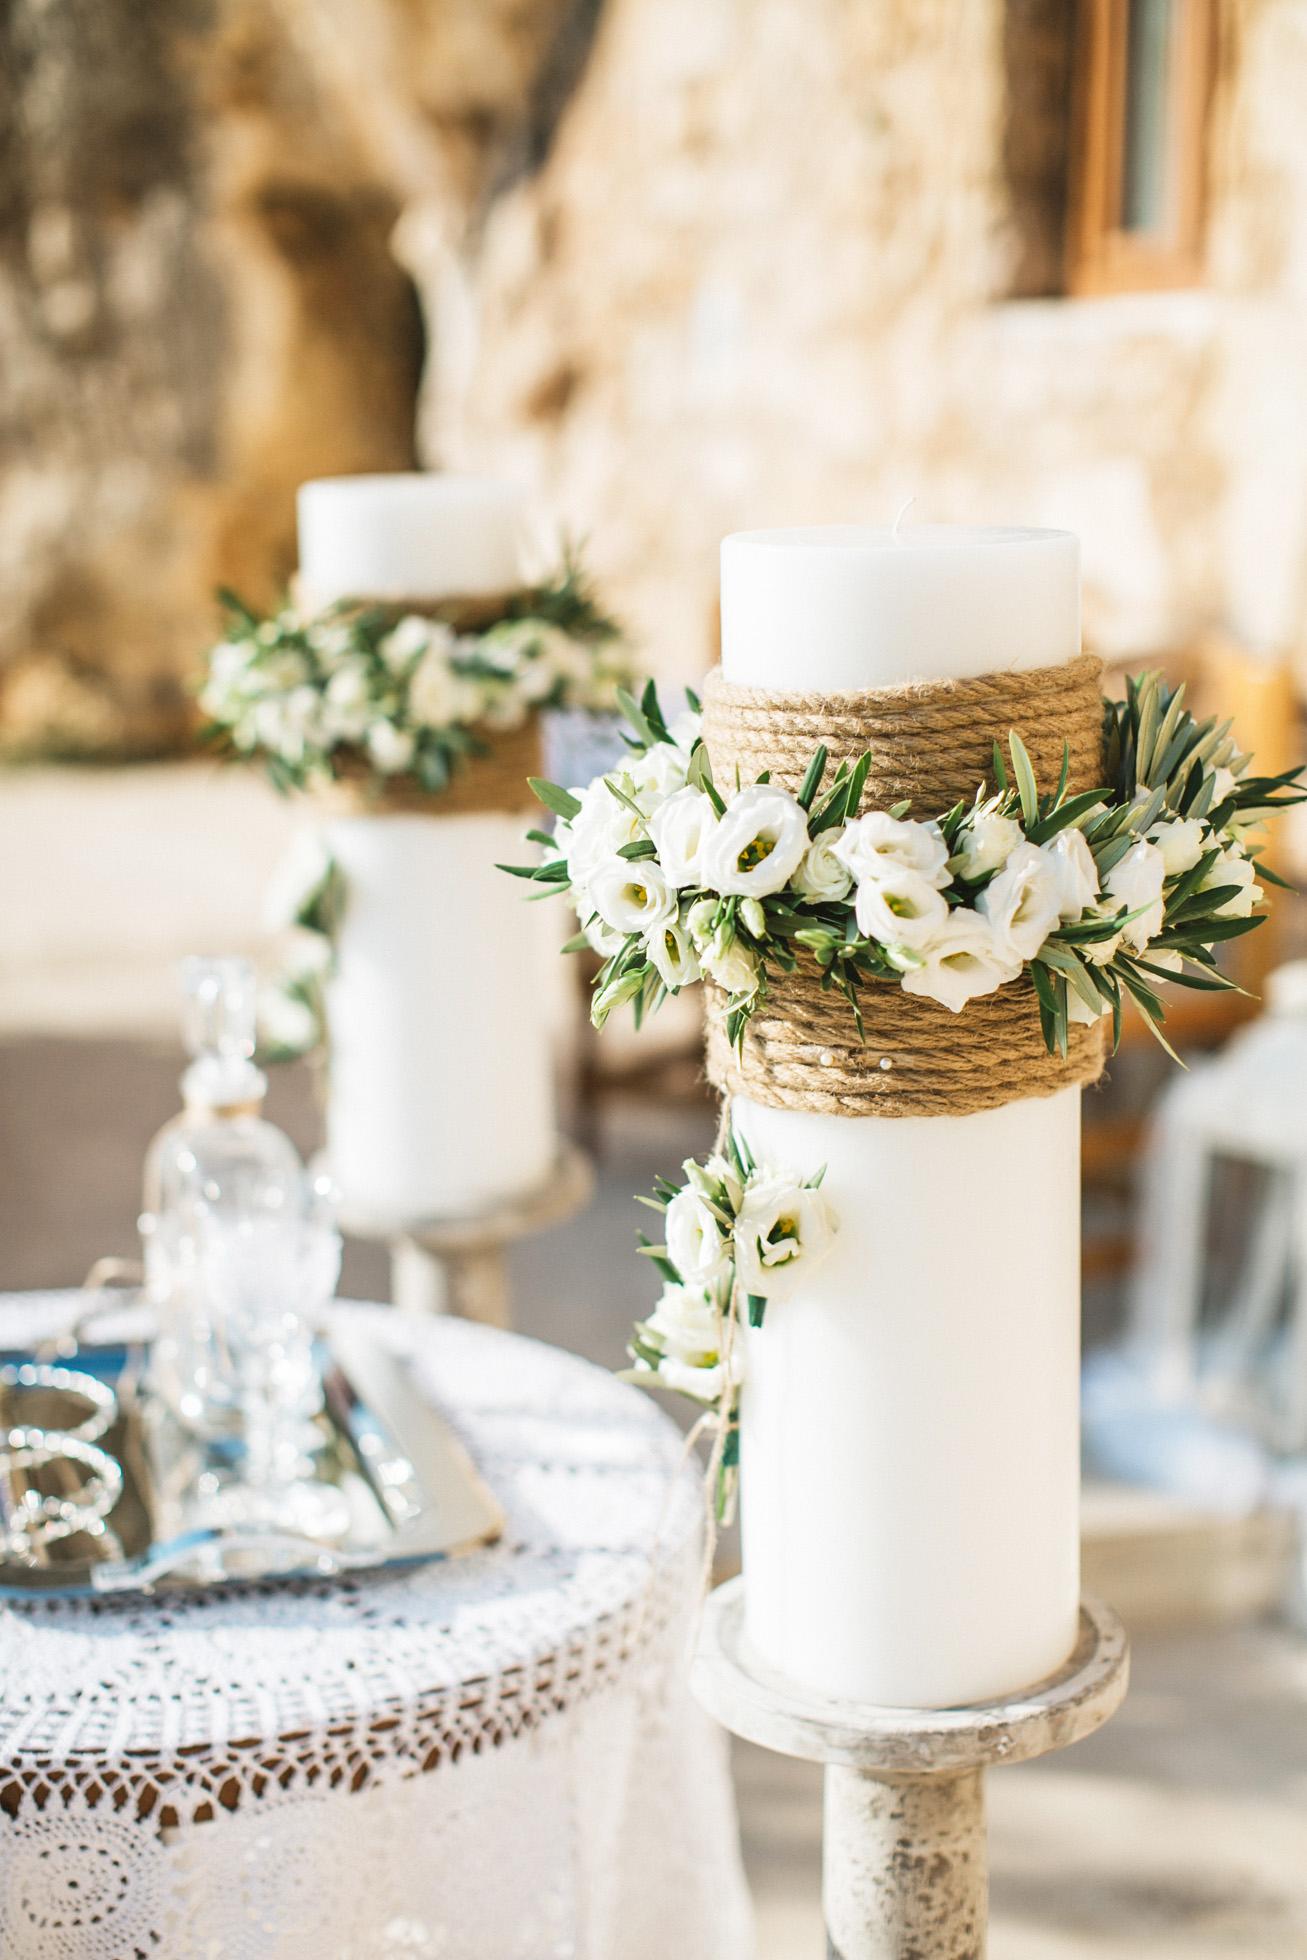 VICKY & NIKOLAY | HannaMonika Wedding Photography - Wedding ...